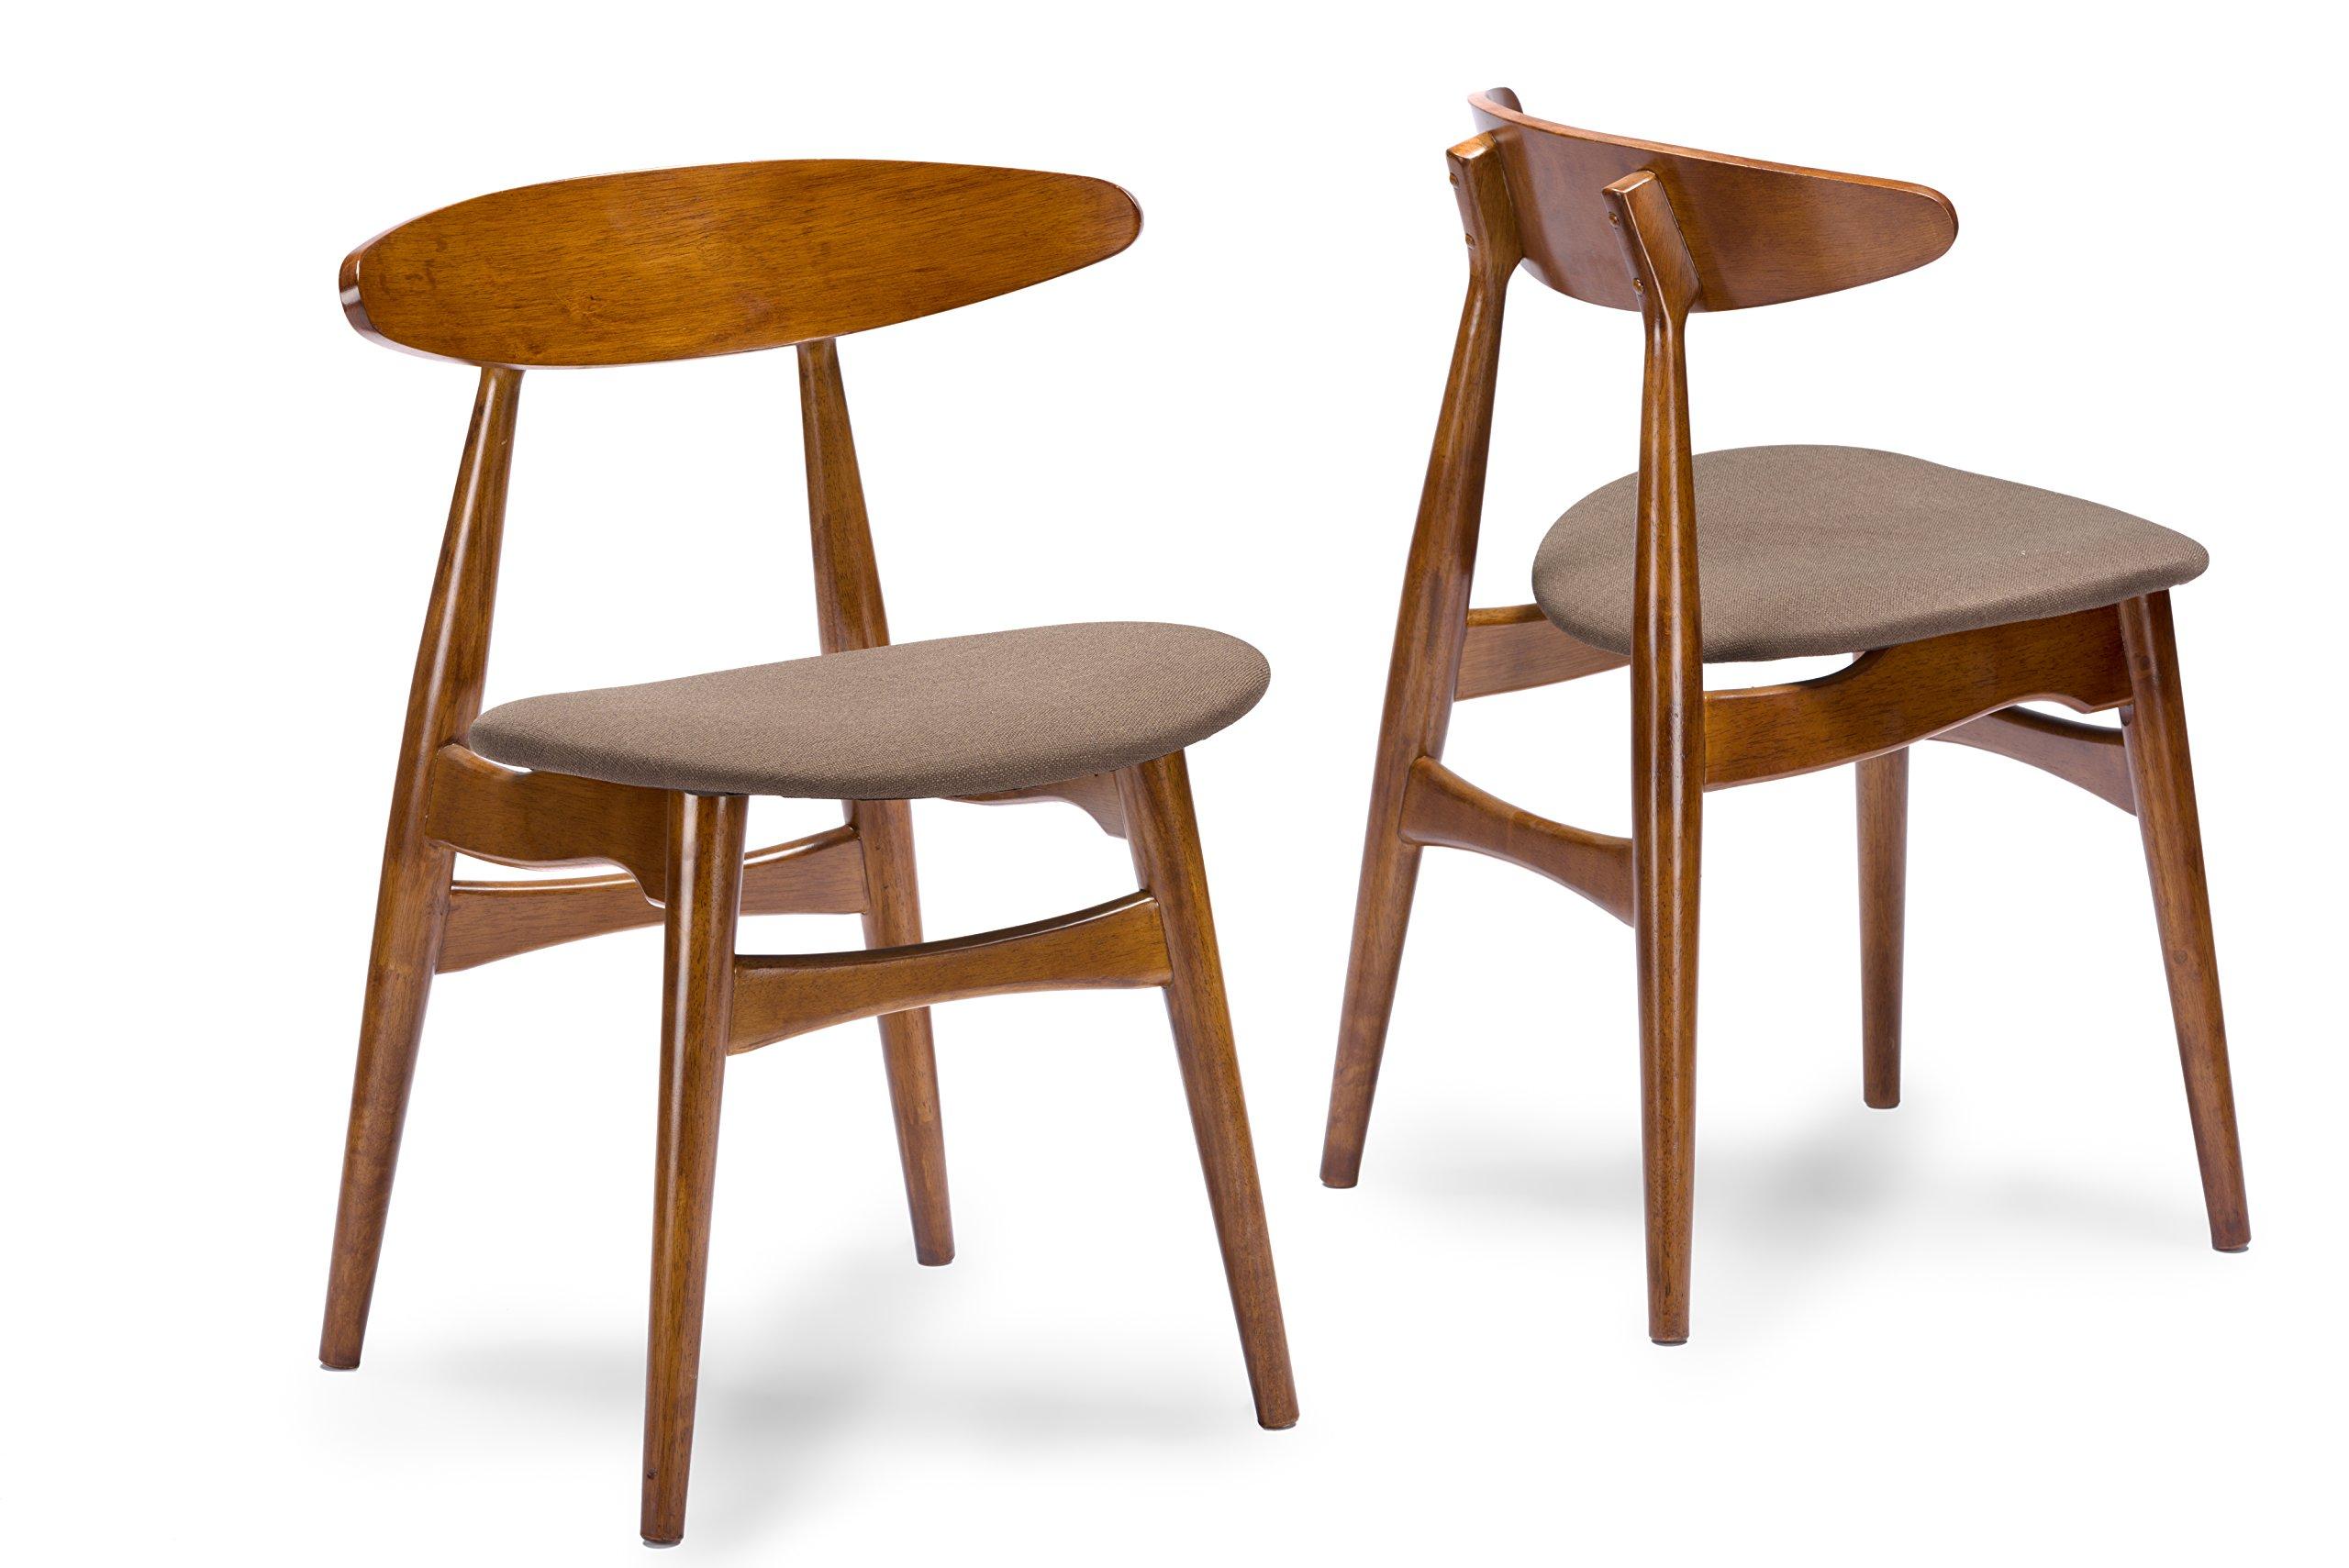 Baxton Studio Set of 2 Flamingo Mid-Century Dark Walnut Wood and Grey Faux Leather Dining Chairs - Mid-Century design set of 2 dining chairs Solid rubber wood with dark walnut veneer finishing, twill fabric Grey fabric with foam padding - kitchen-dining-room-furniture, kitchen-dining-room, kitchen-dining-room-chairs - 81XU2kbZOQL -